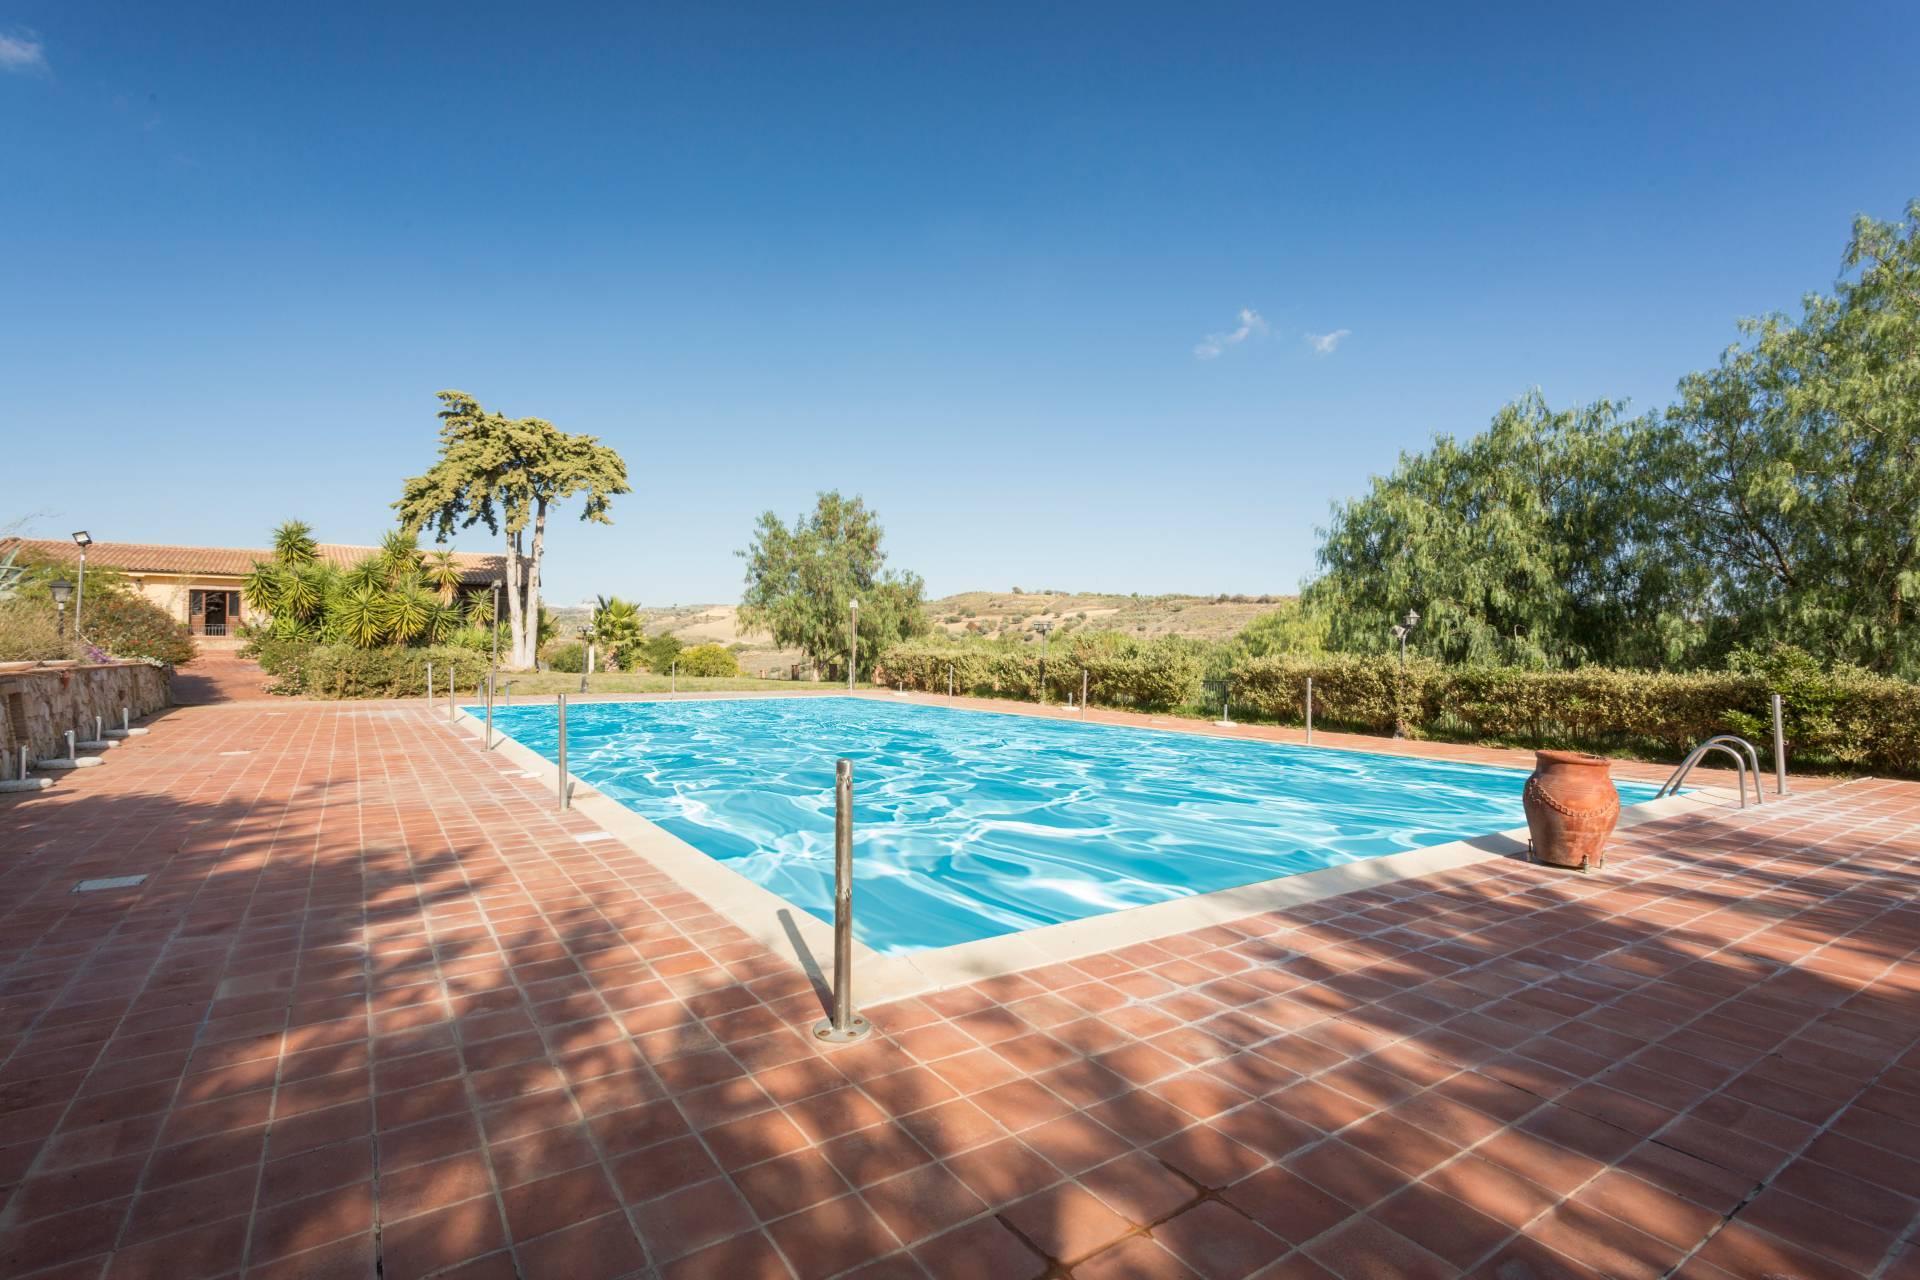 Villa in Vendita a Piazza Armerina: 5 locali, 550 mq - Foto 11